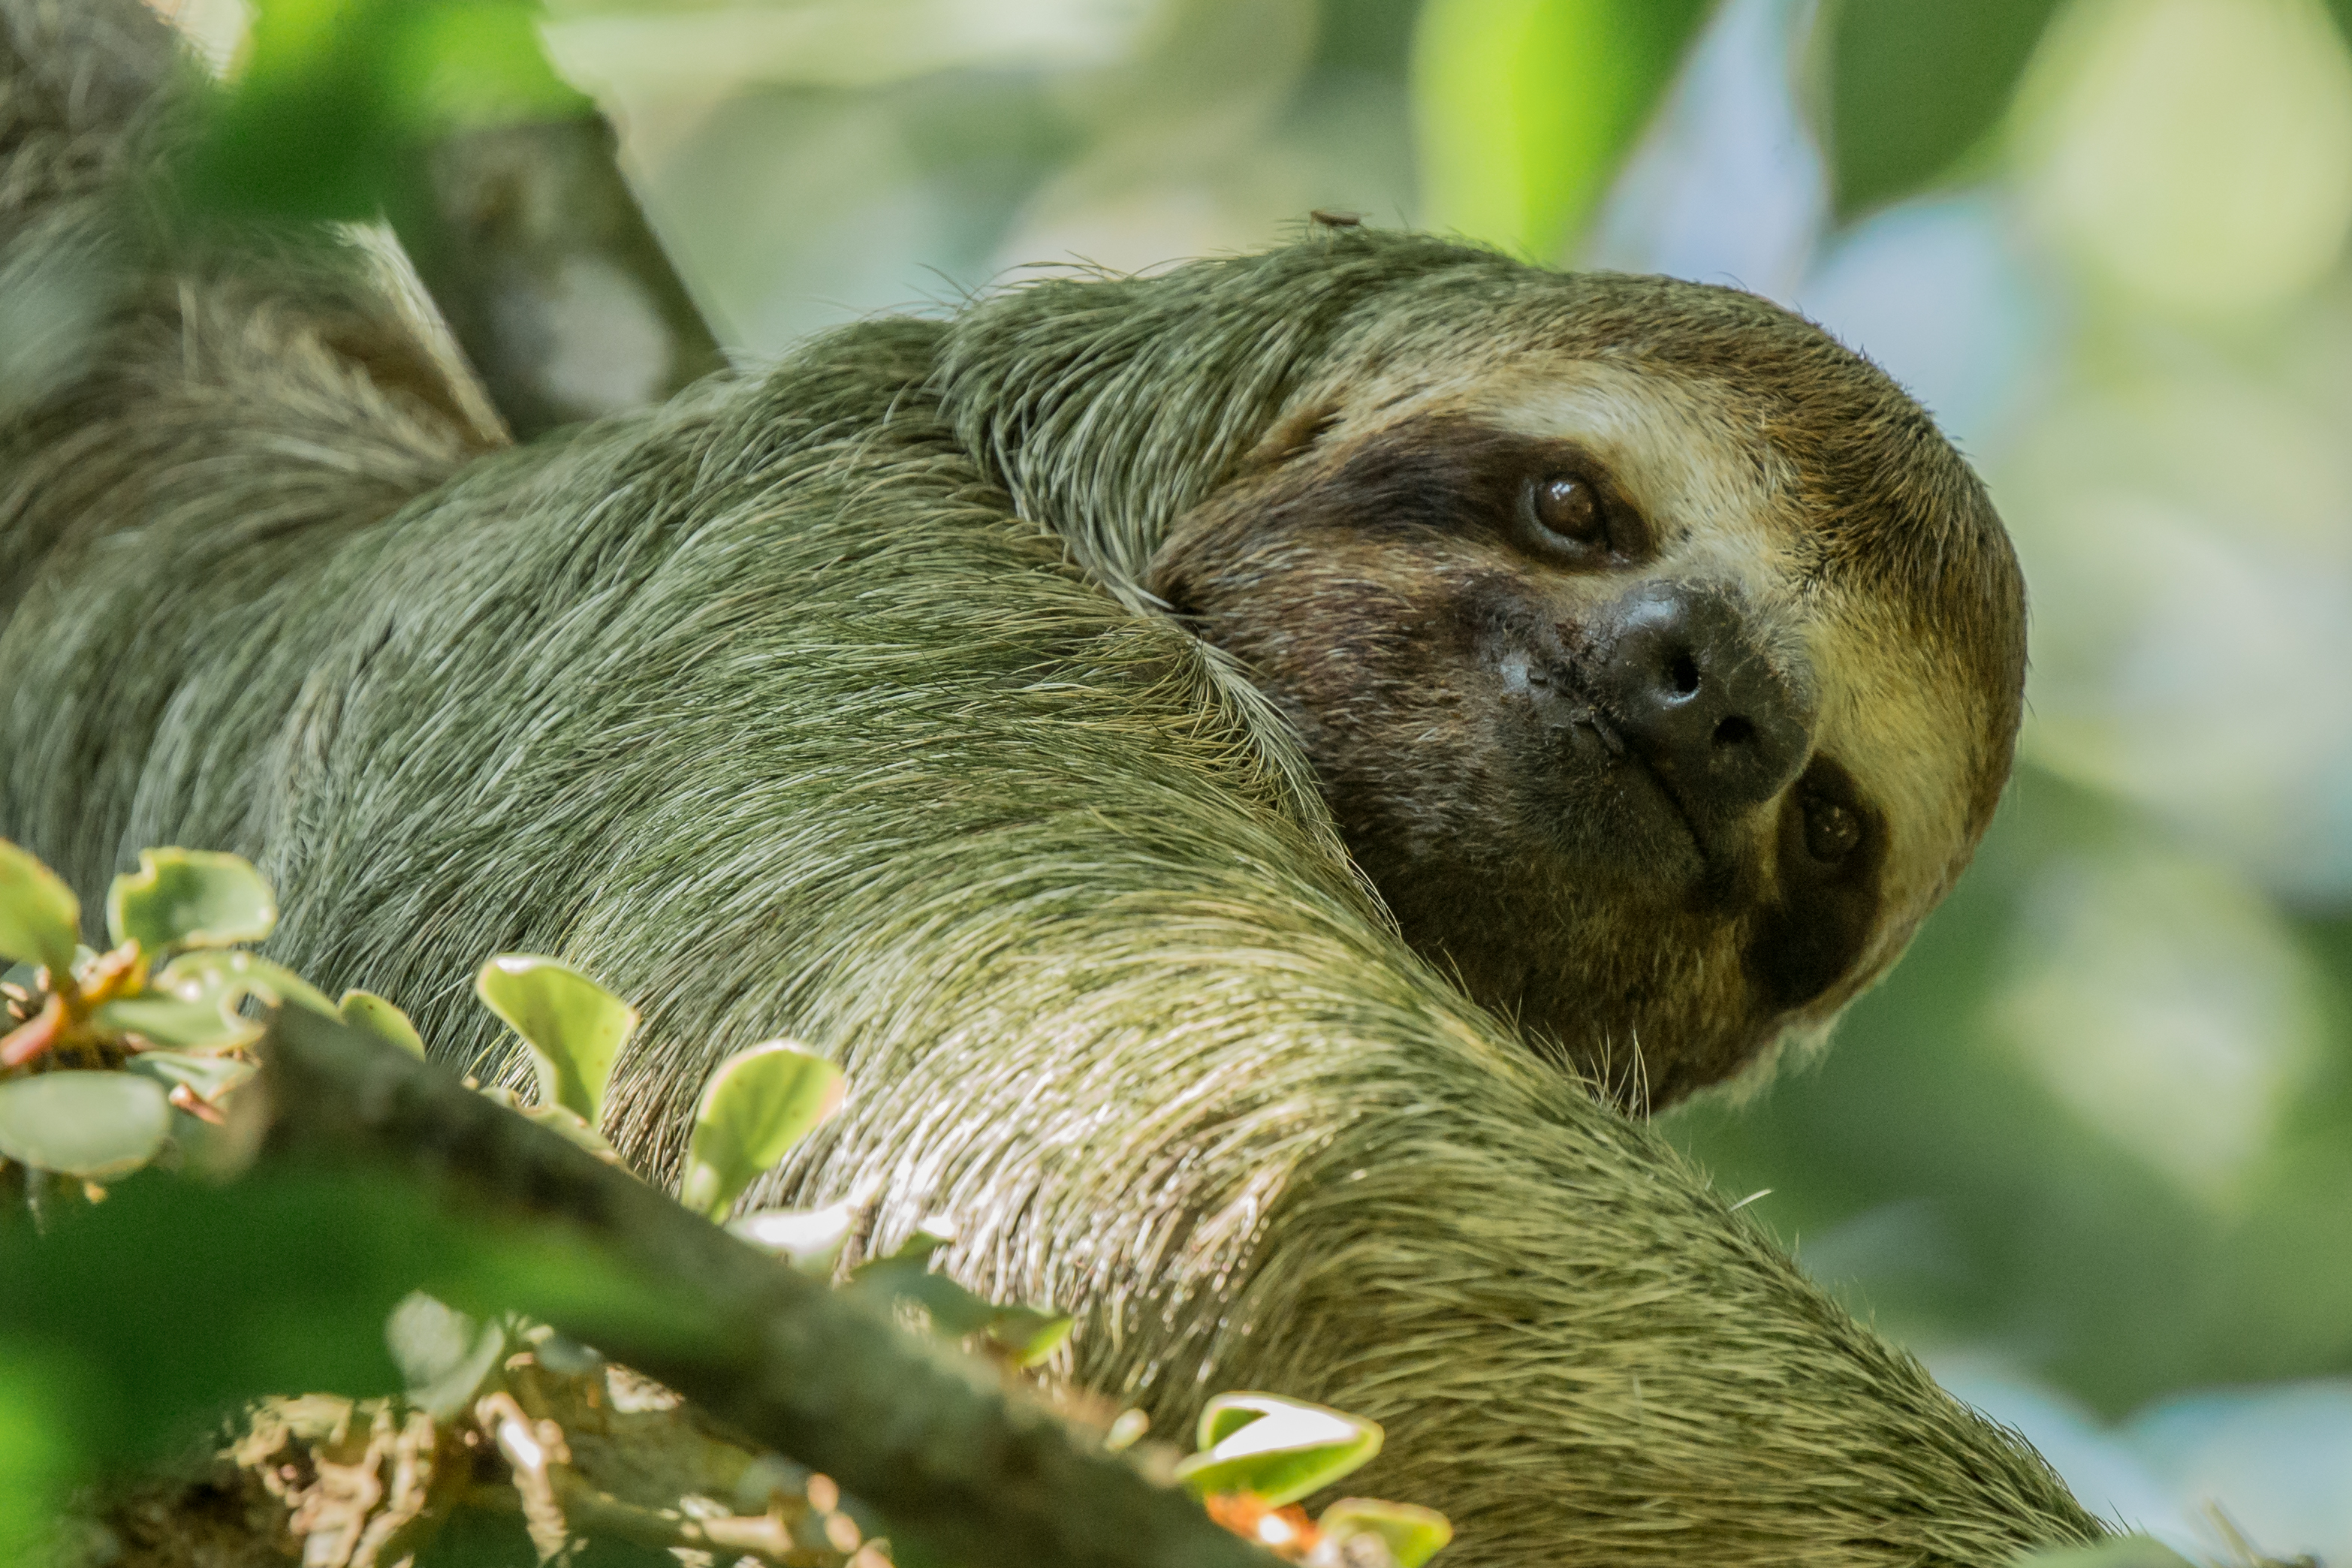 Paresseux à 3 doigts - Costa Rica